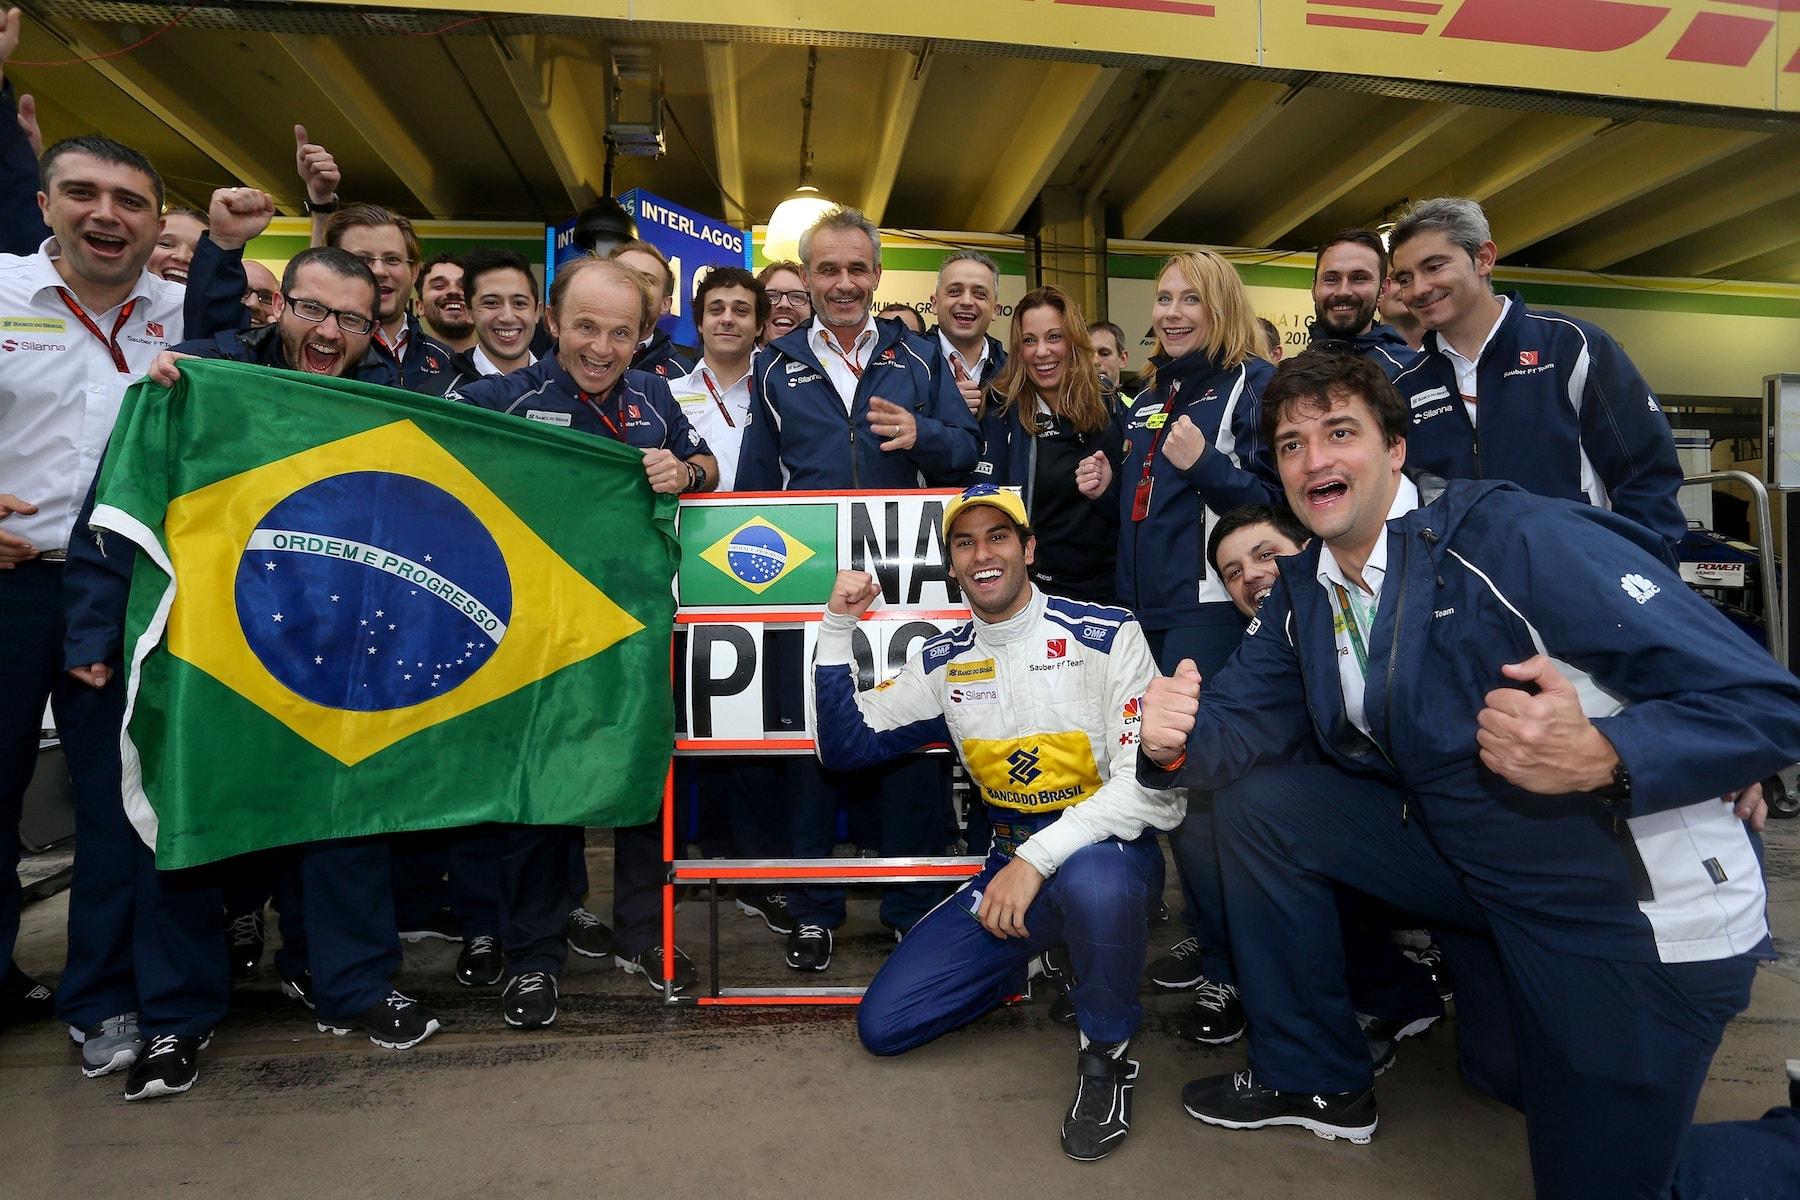 Salracing - Felipe Nasr P9 celebration at Sauber F1 Team